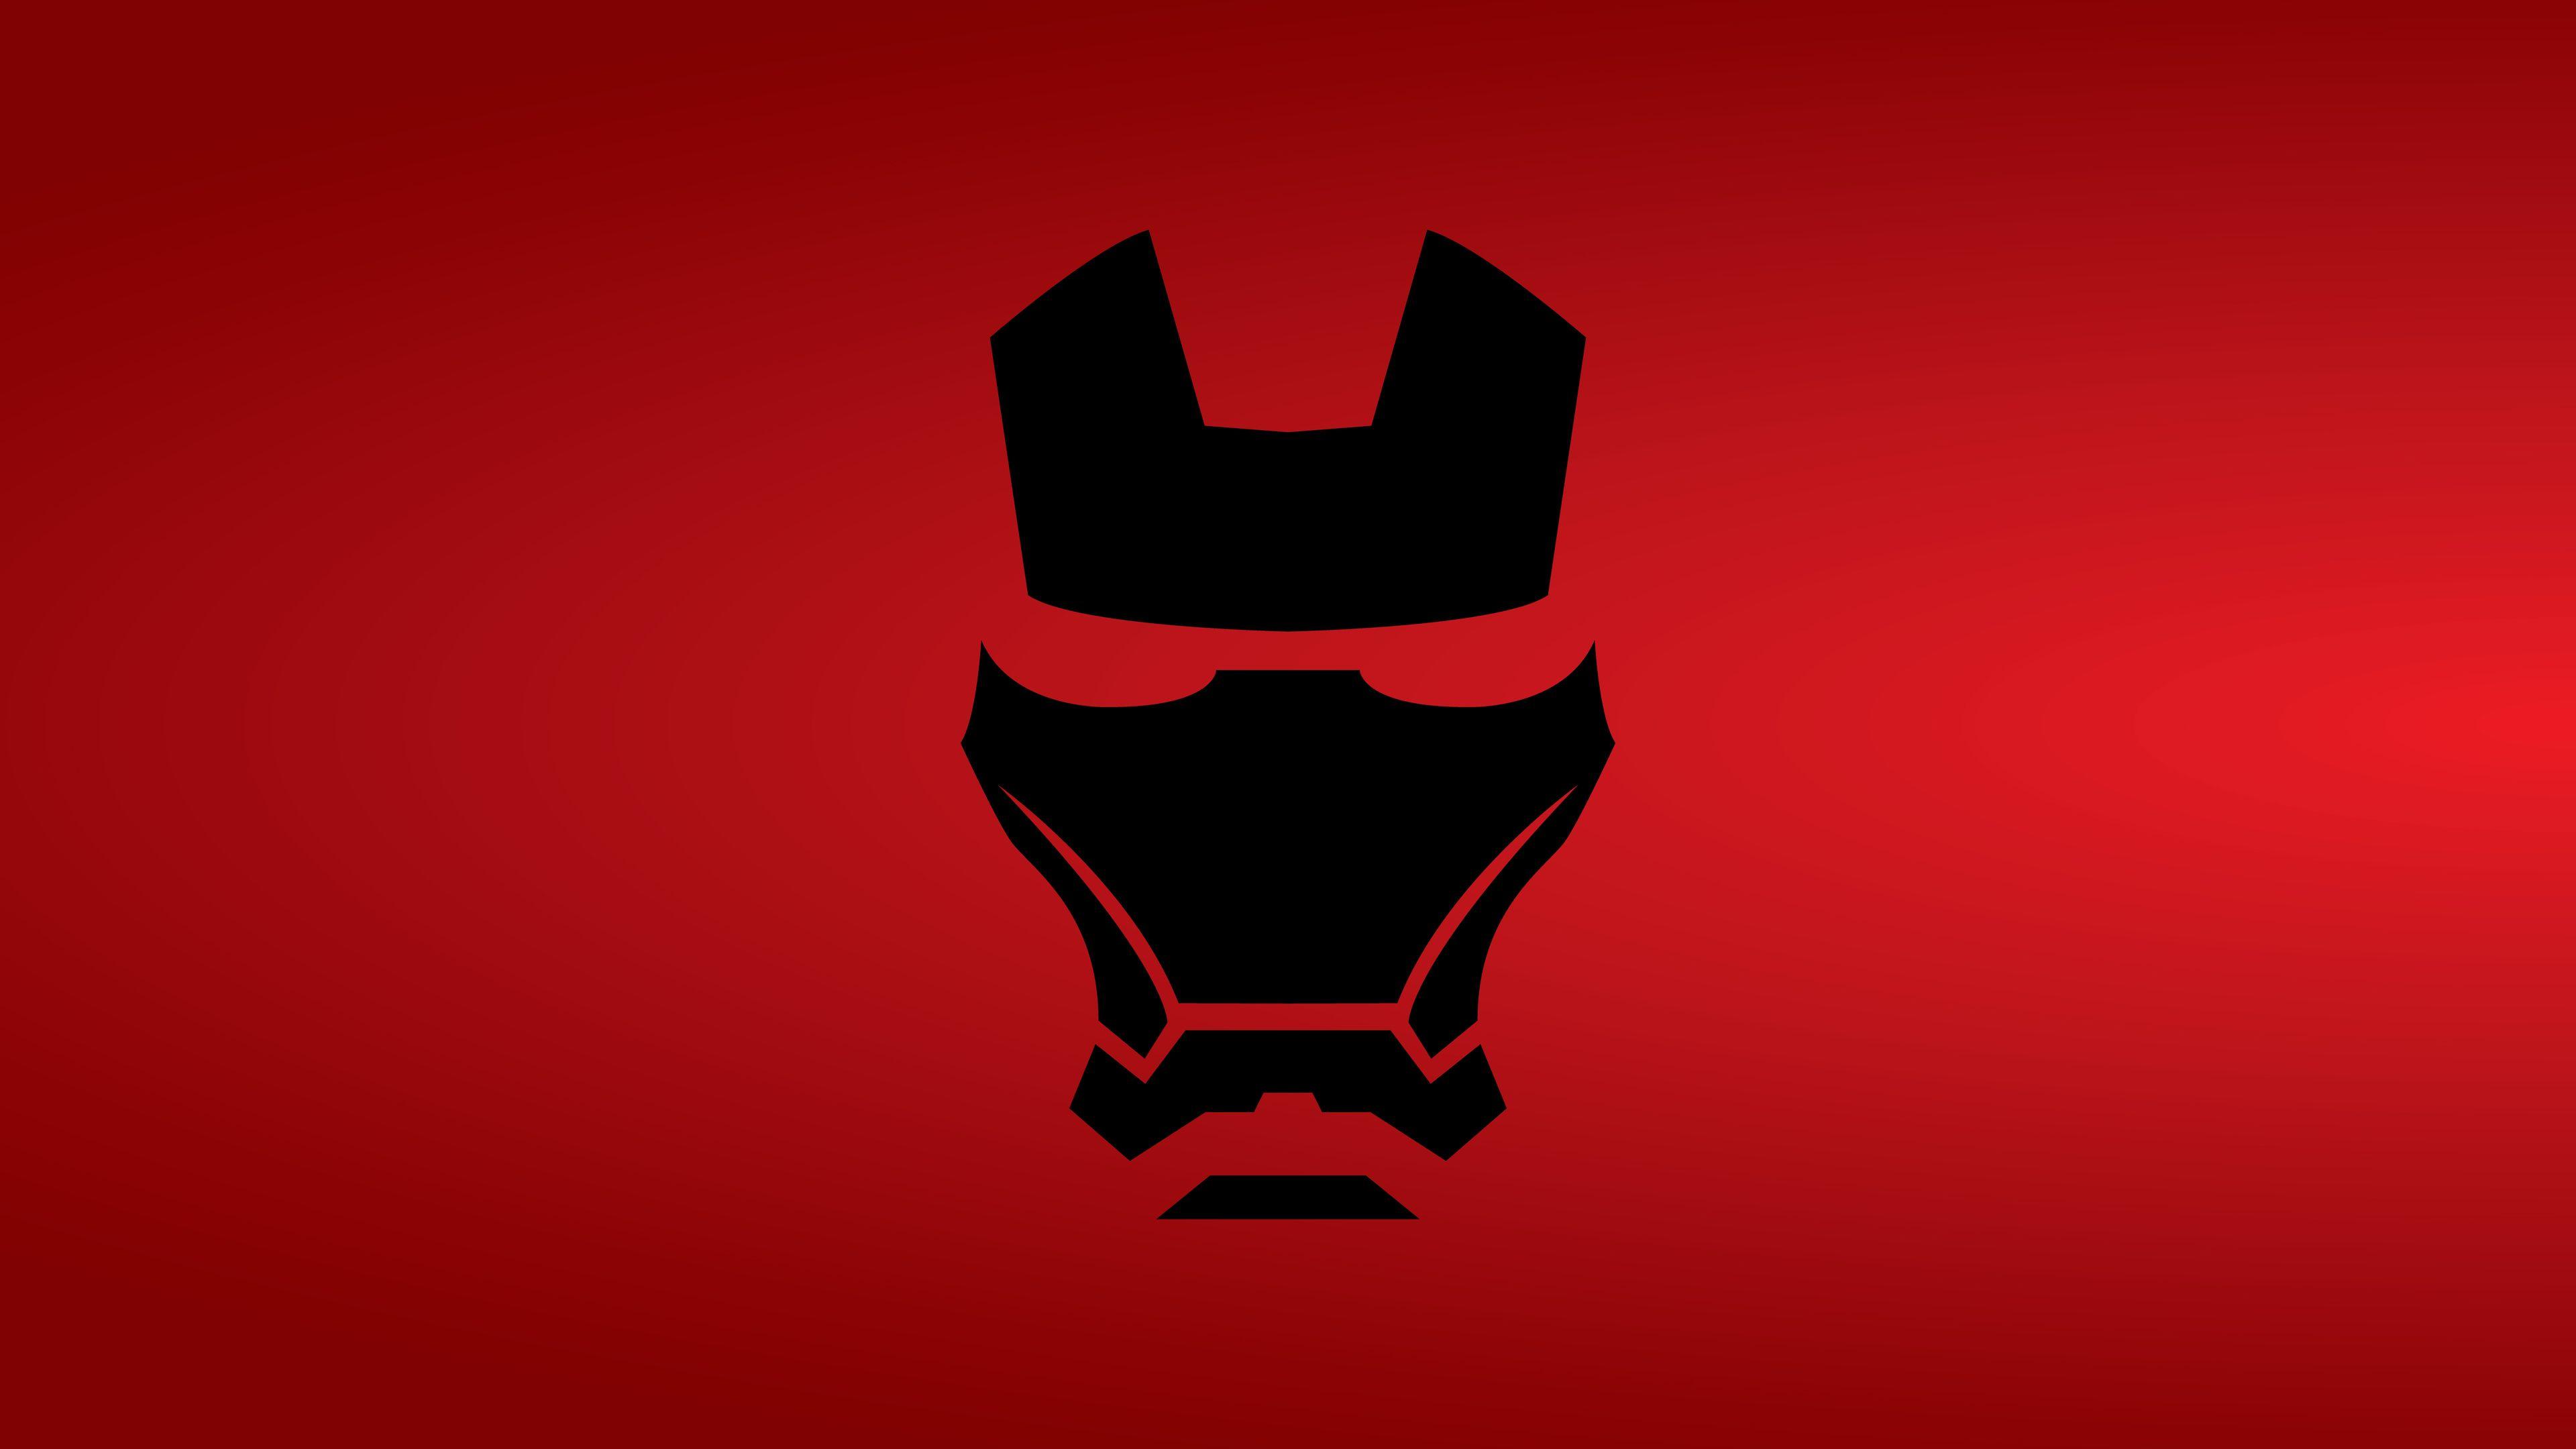 Iron Man Mask Minimalist 4k Superheroes Wallpapers Red Wallpapers Minimalist Wallpapers Minimalism Wallpapers Iron Man Wallpaper Red Wallpaper Iron Man Mask